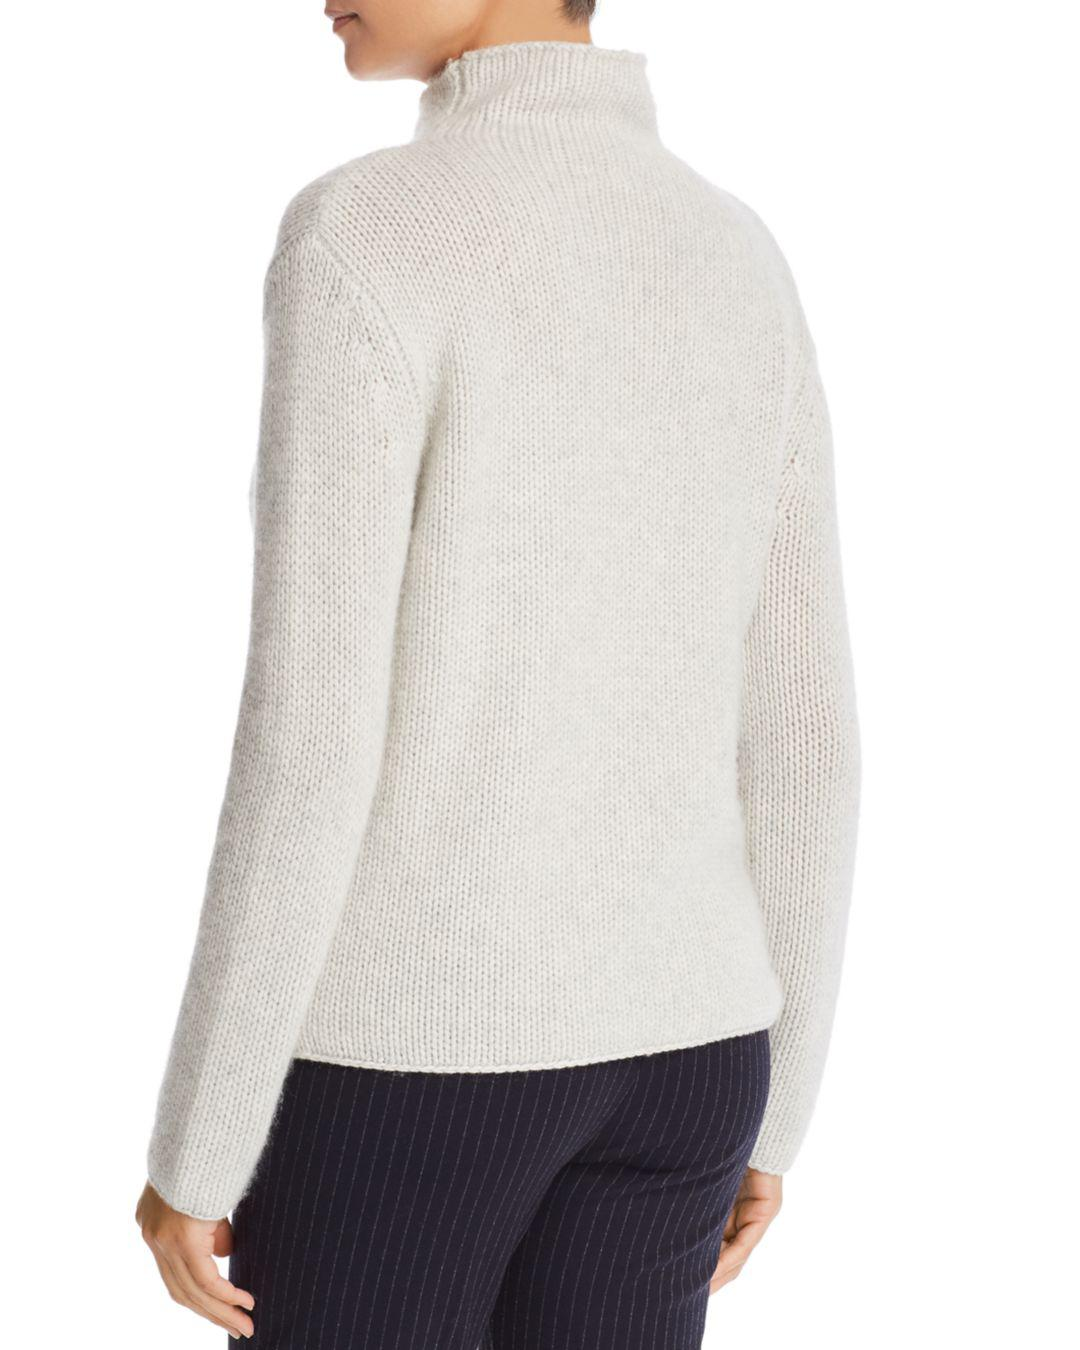 c521c672cc Lyst - Majestic Filatures Cashmere Mock-neck Sweater in White